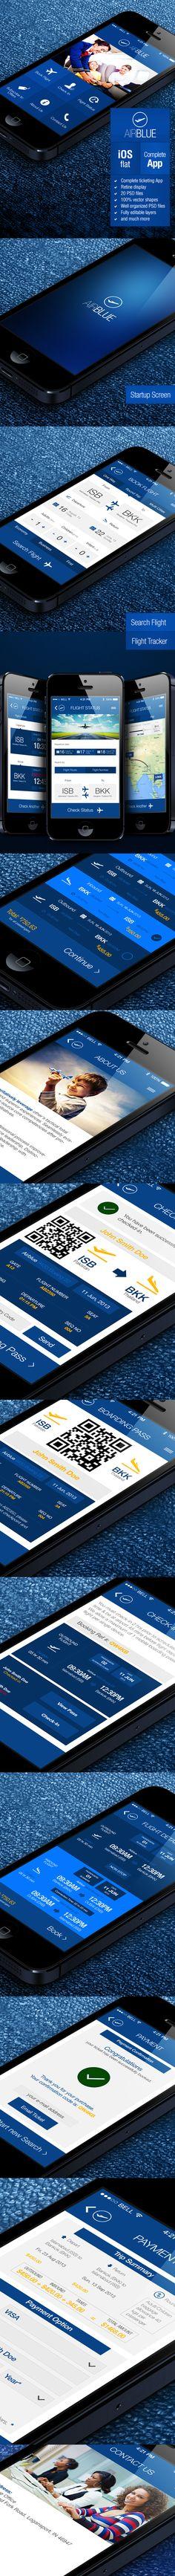 AirBlue - Flight Ticket Booking App by fida khattak, via Behance